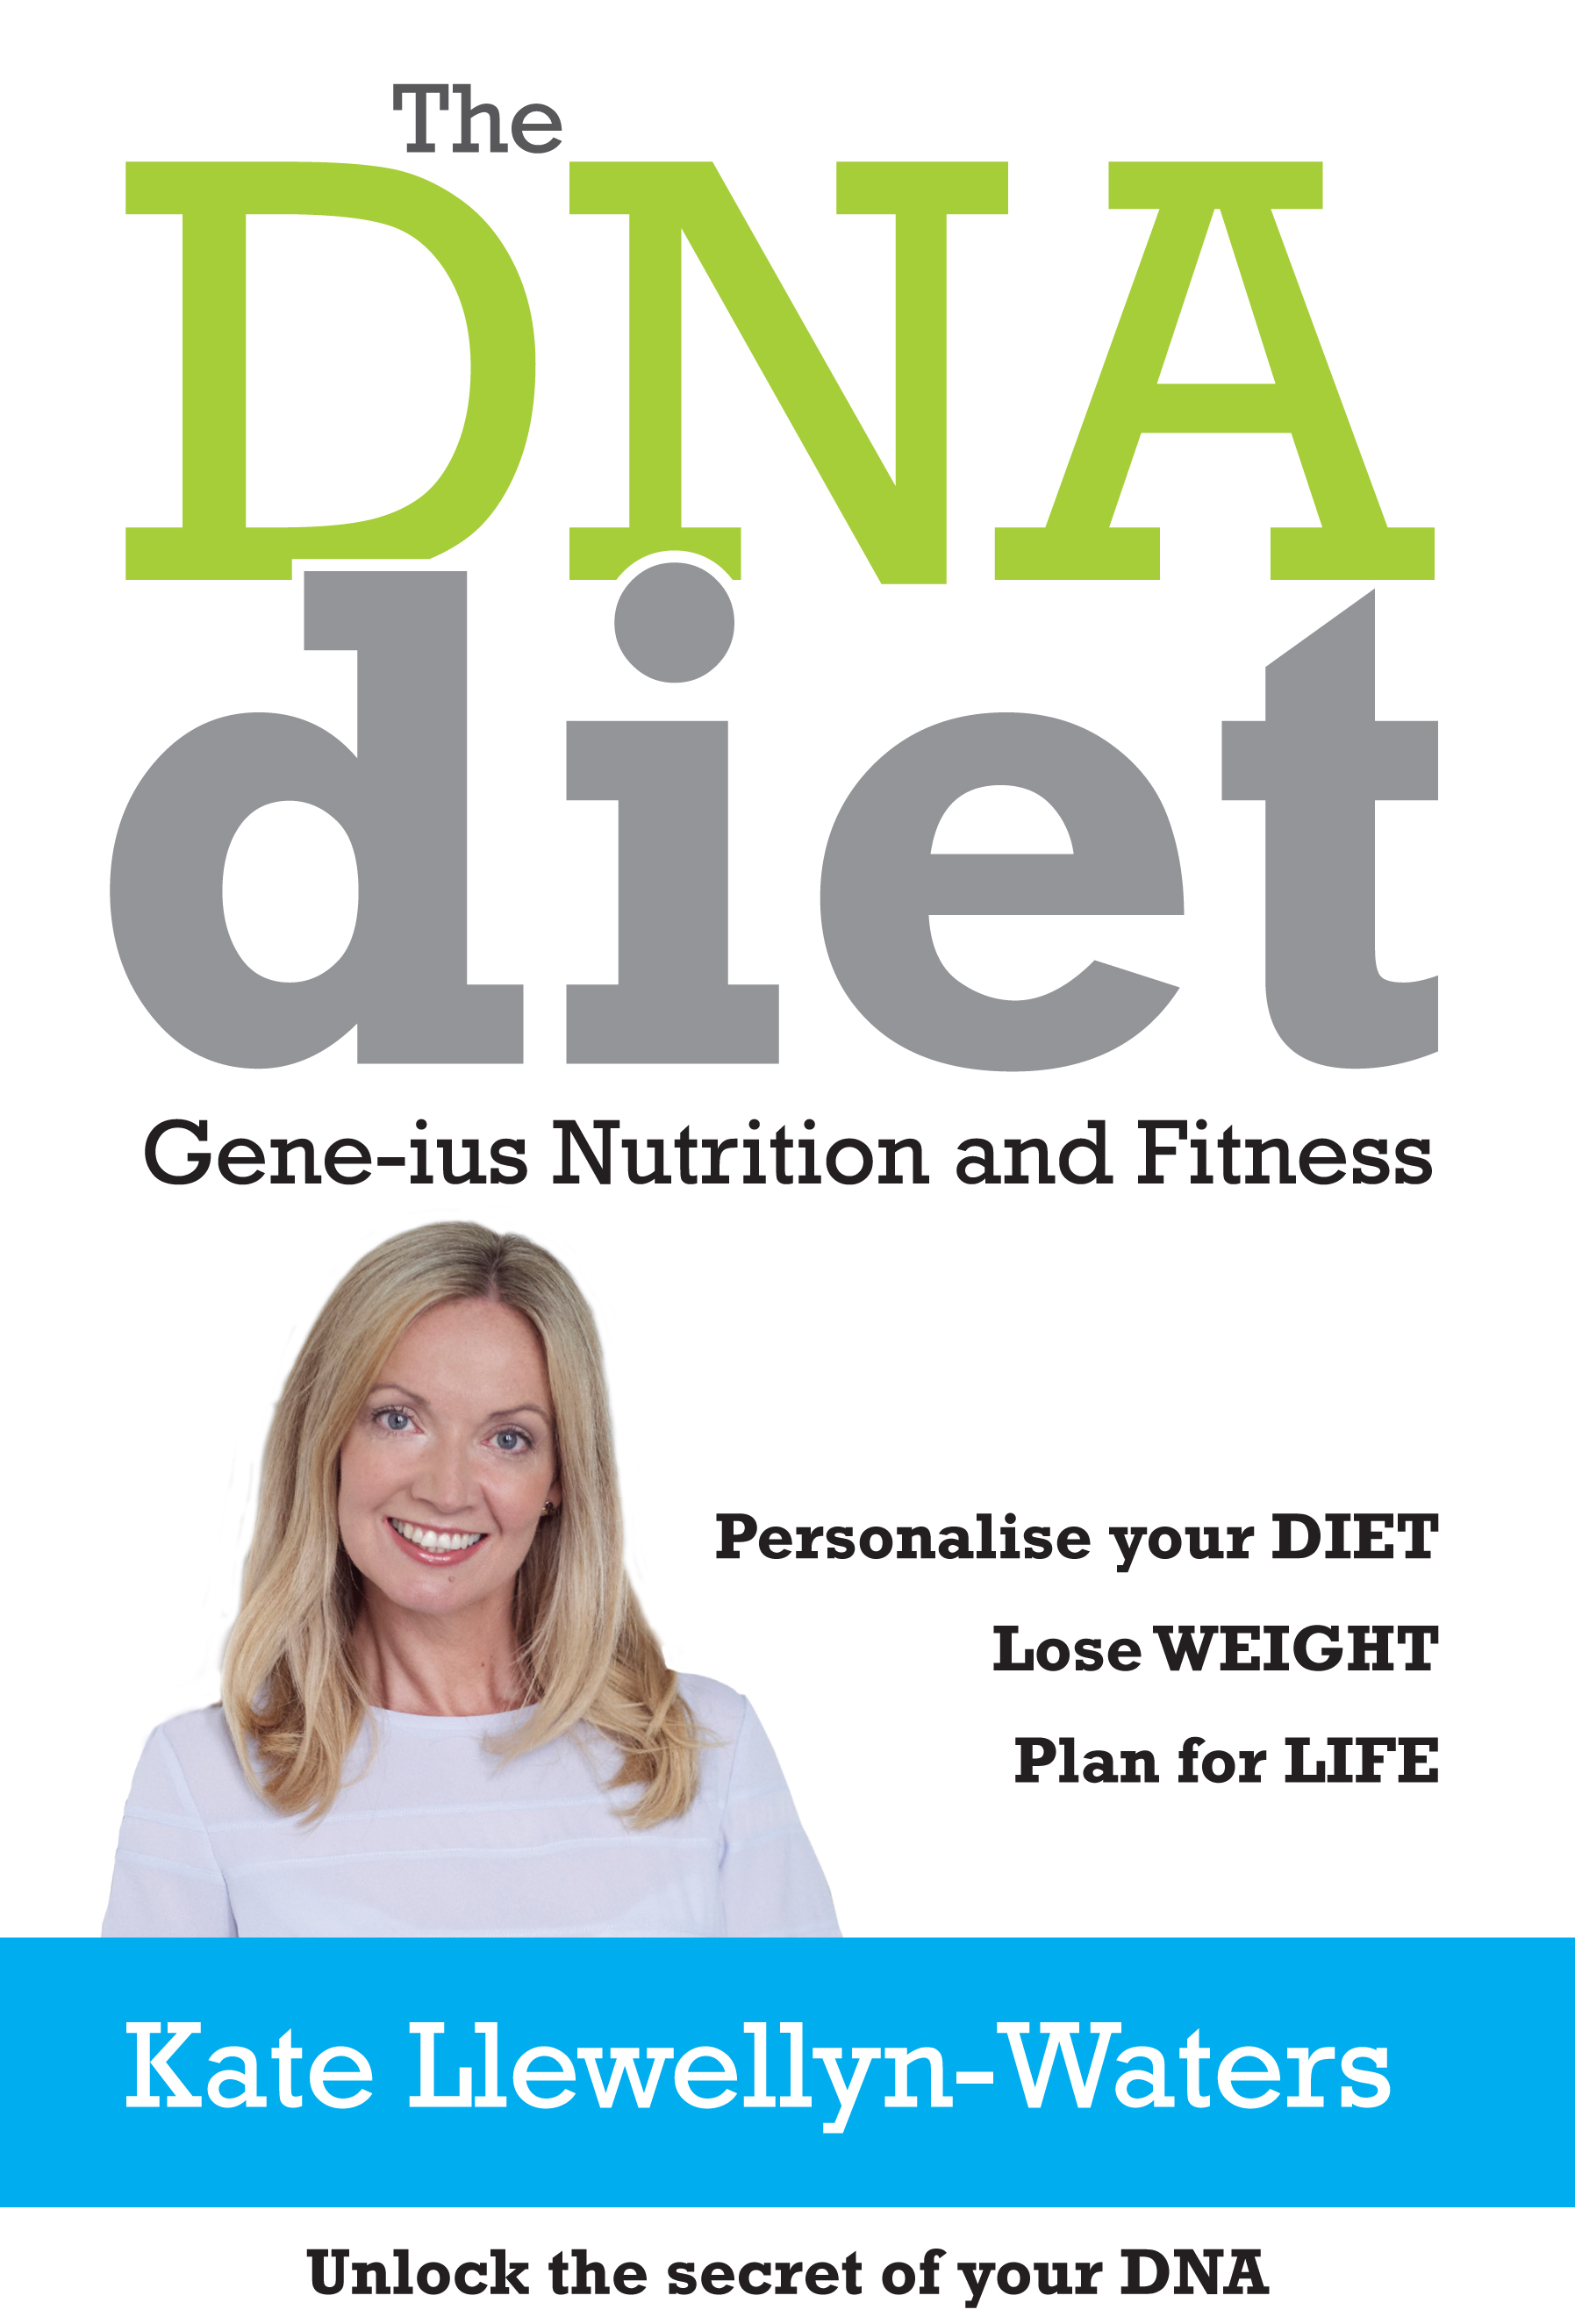 The-DNA-Diet-Jacket-image-1